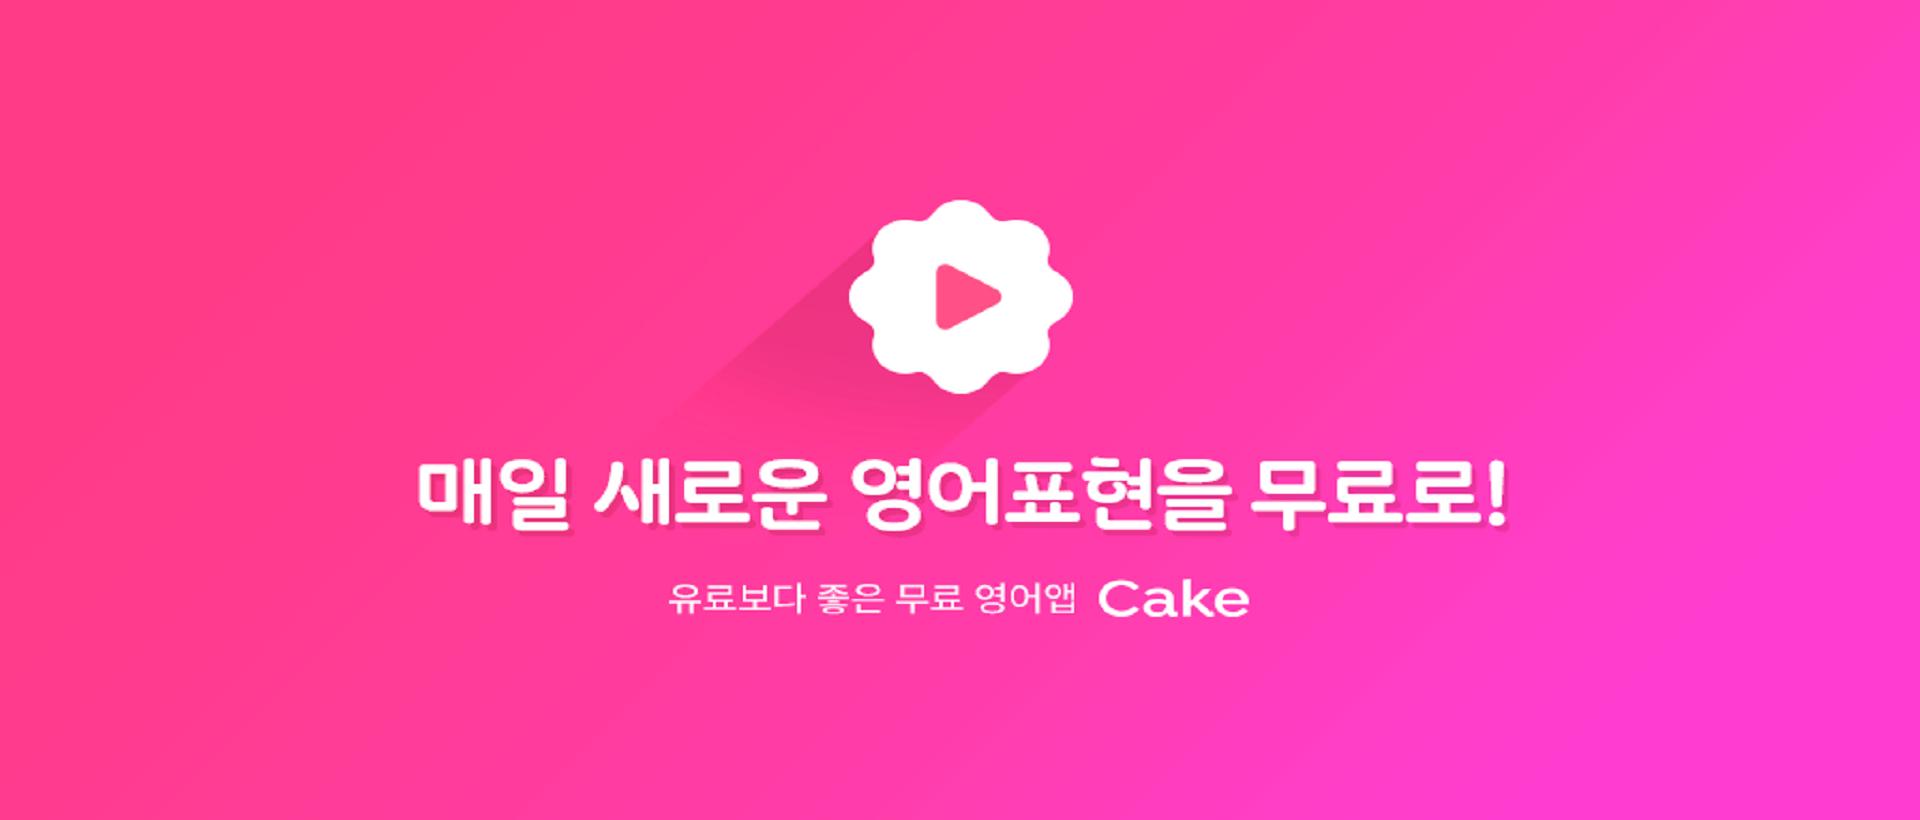 Cake(케이크)